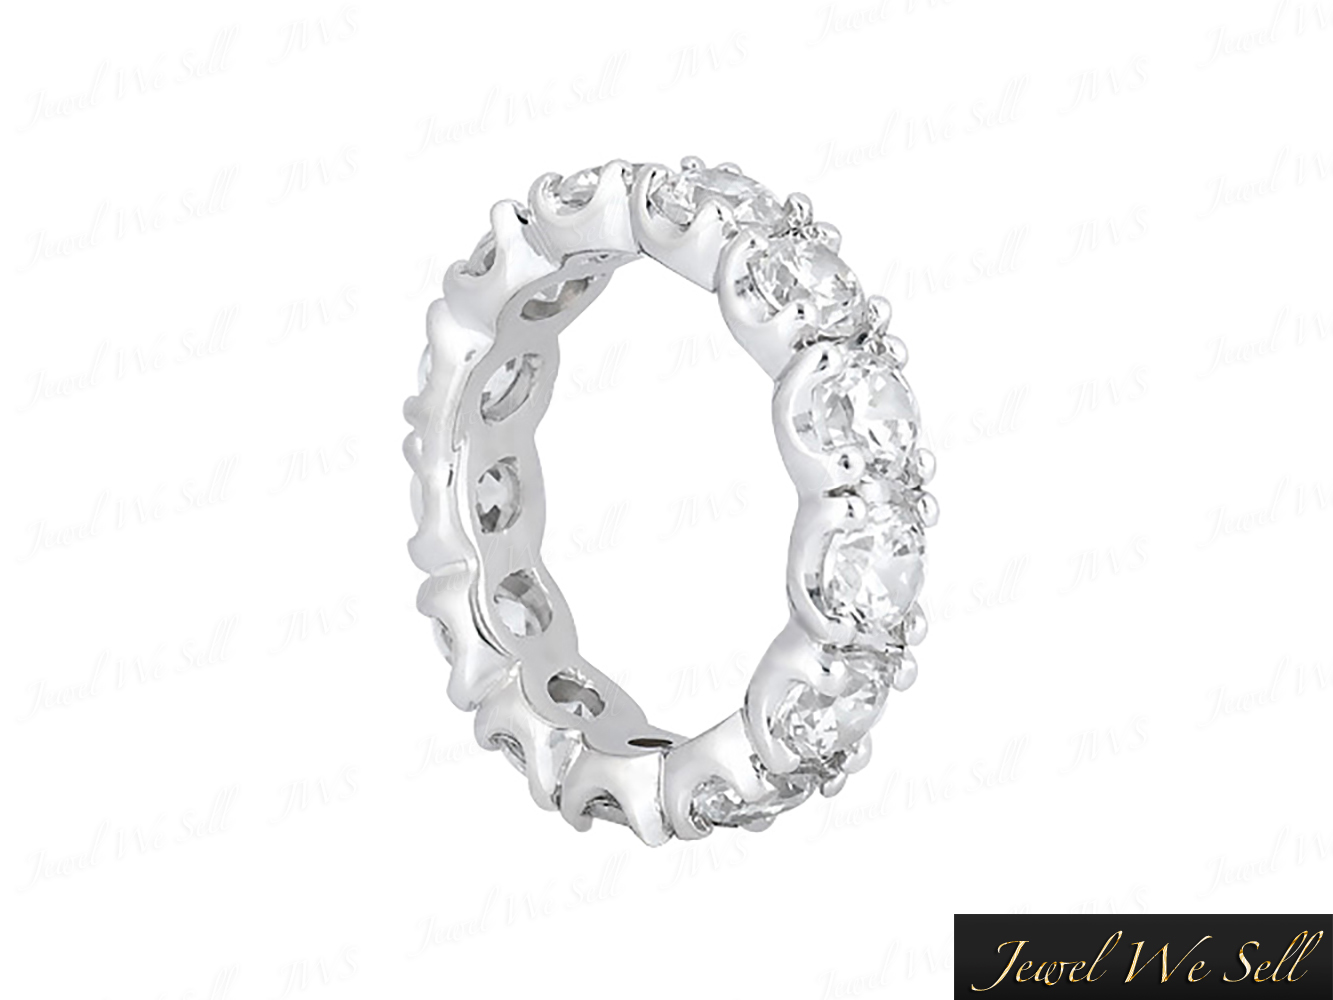 2-00Ct-Round-Brilliant-Cut-Diamond-U-Prong-Eternity-Band-Ring-950-Platinum-F-VS1